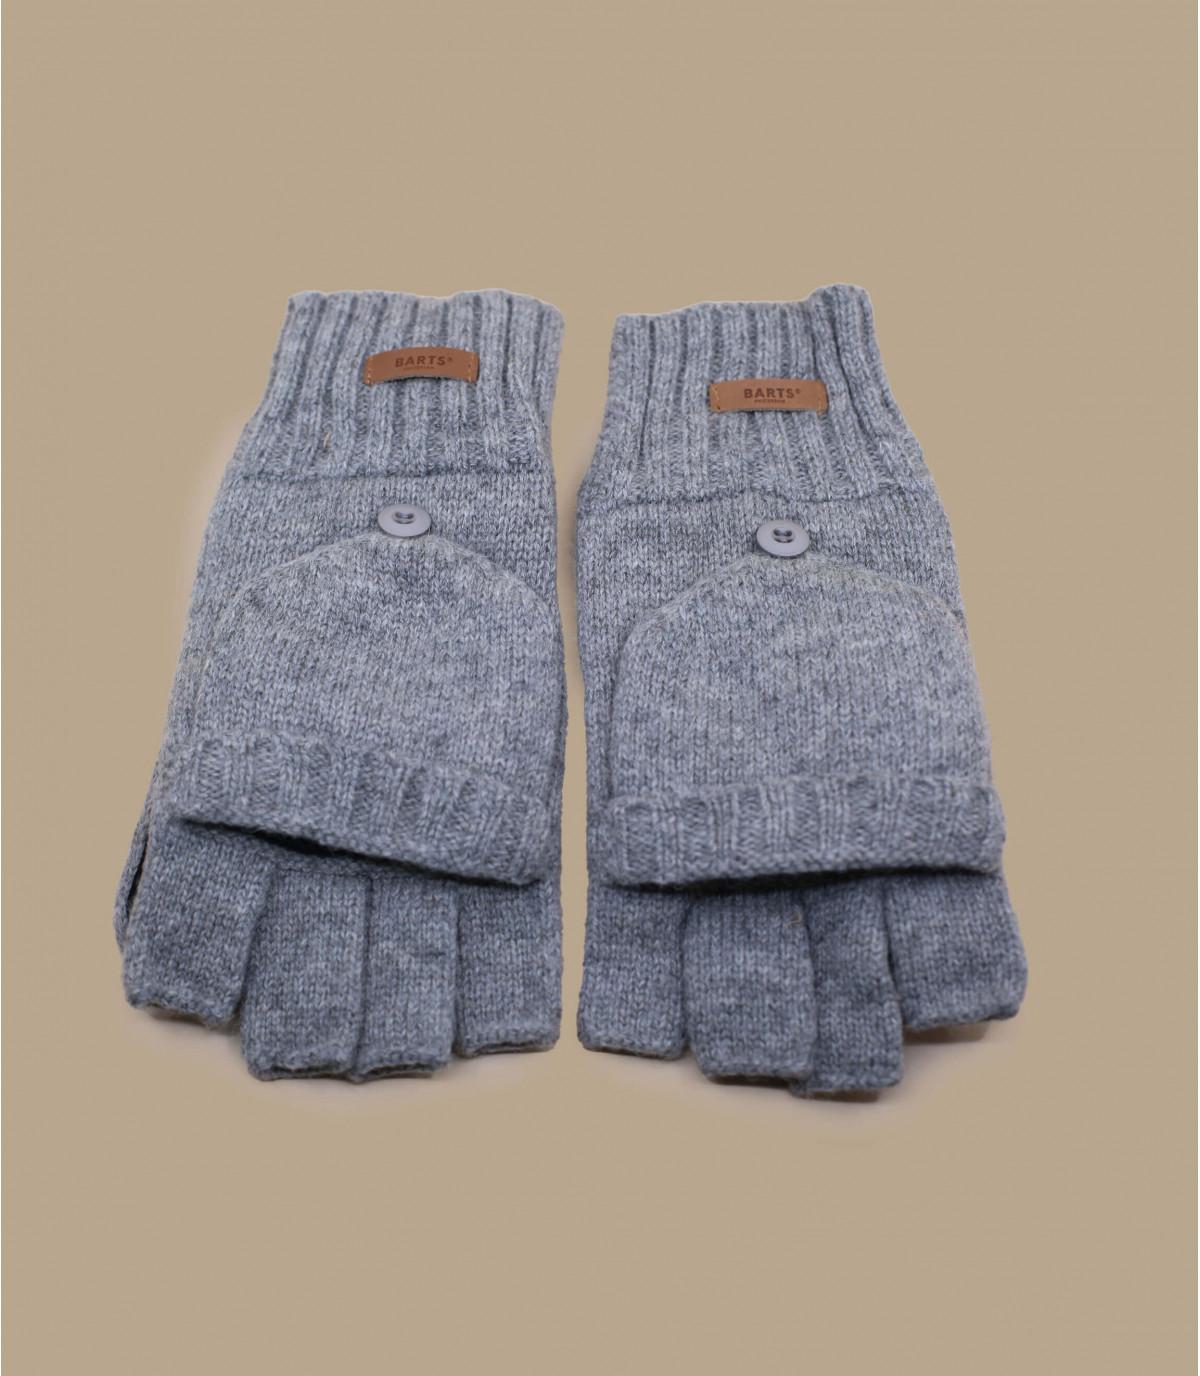 Haakon Bumglove heather grey